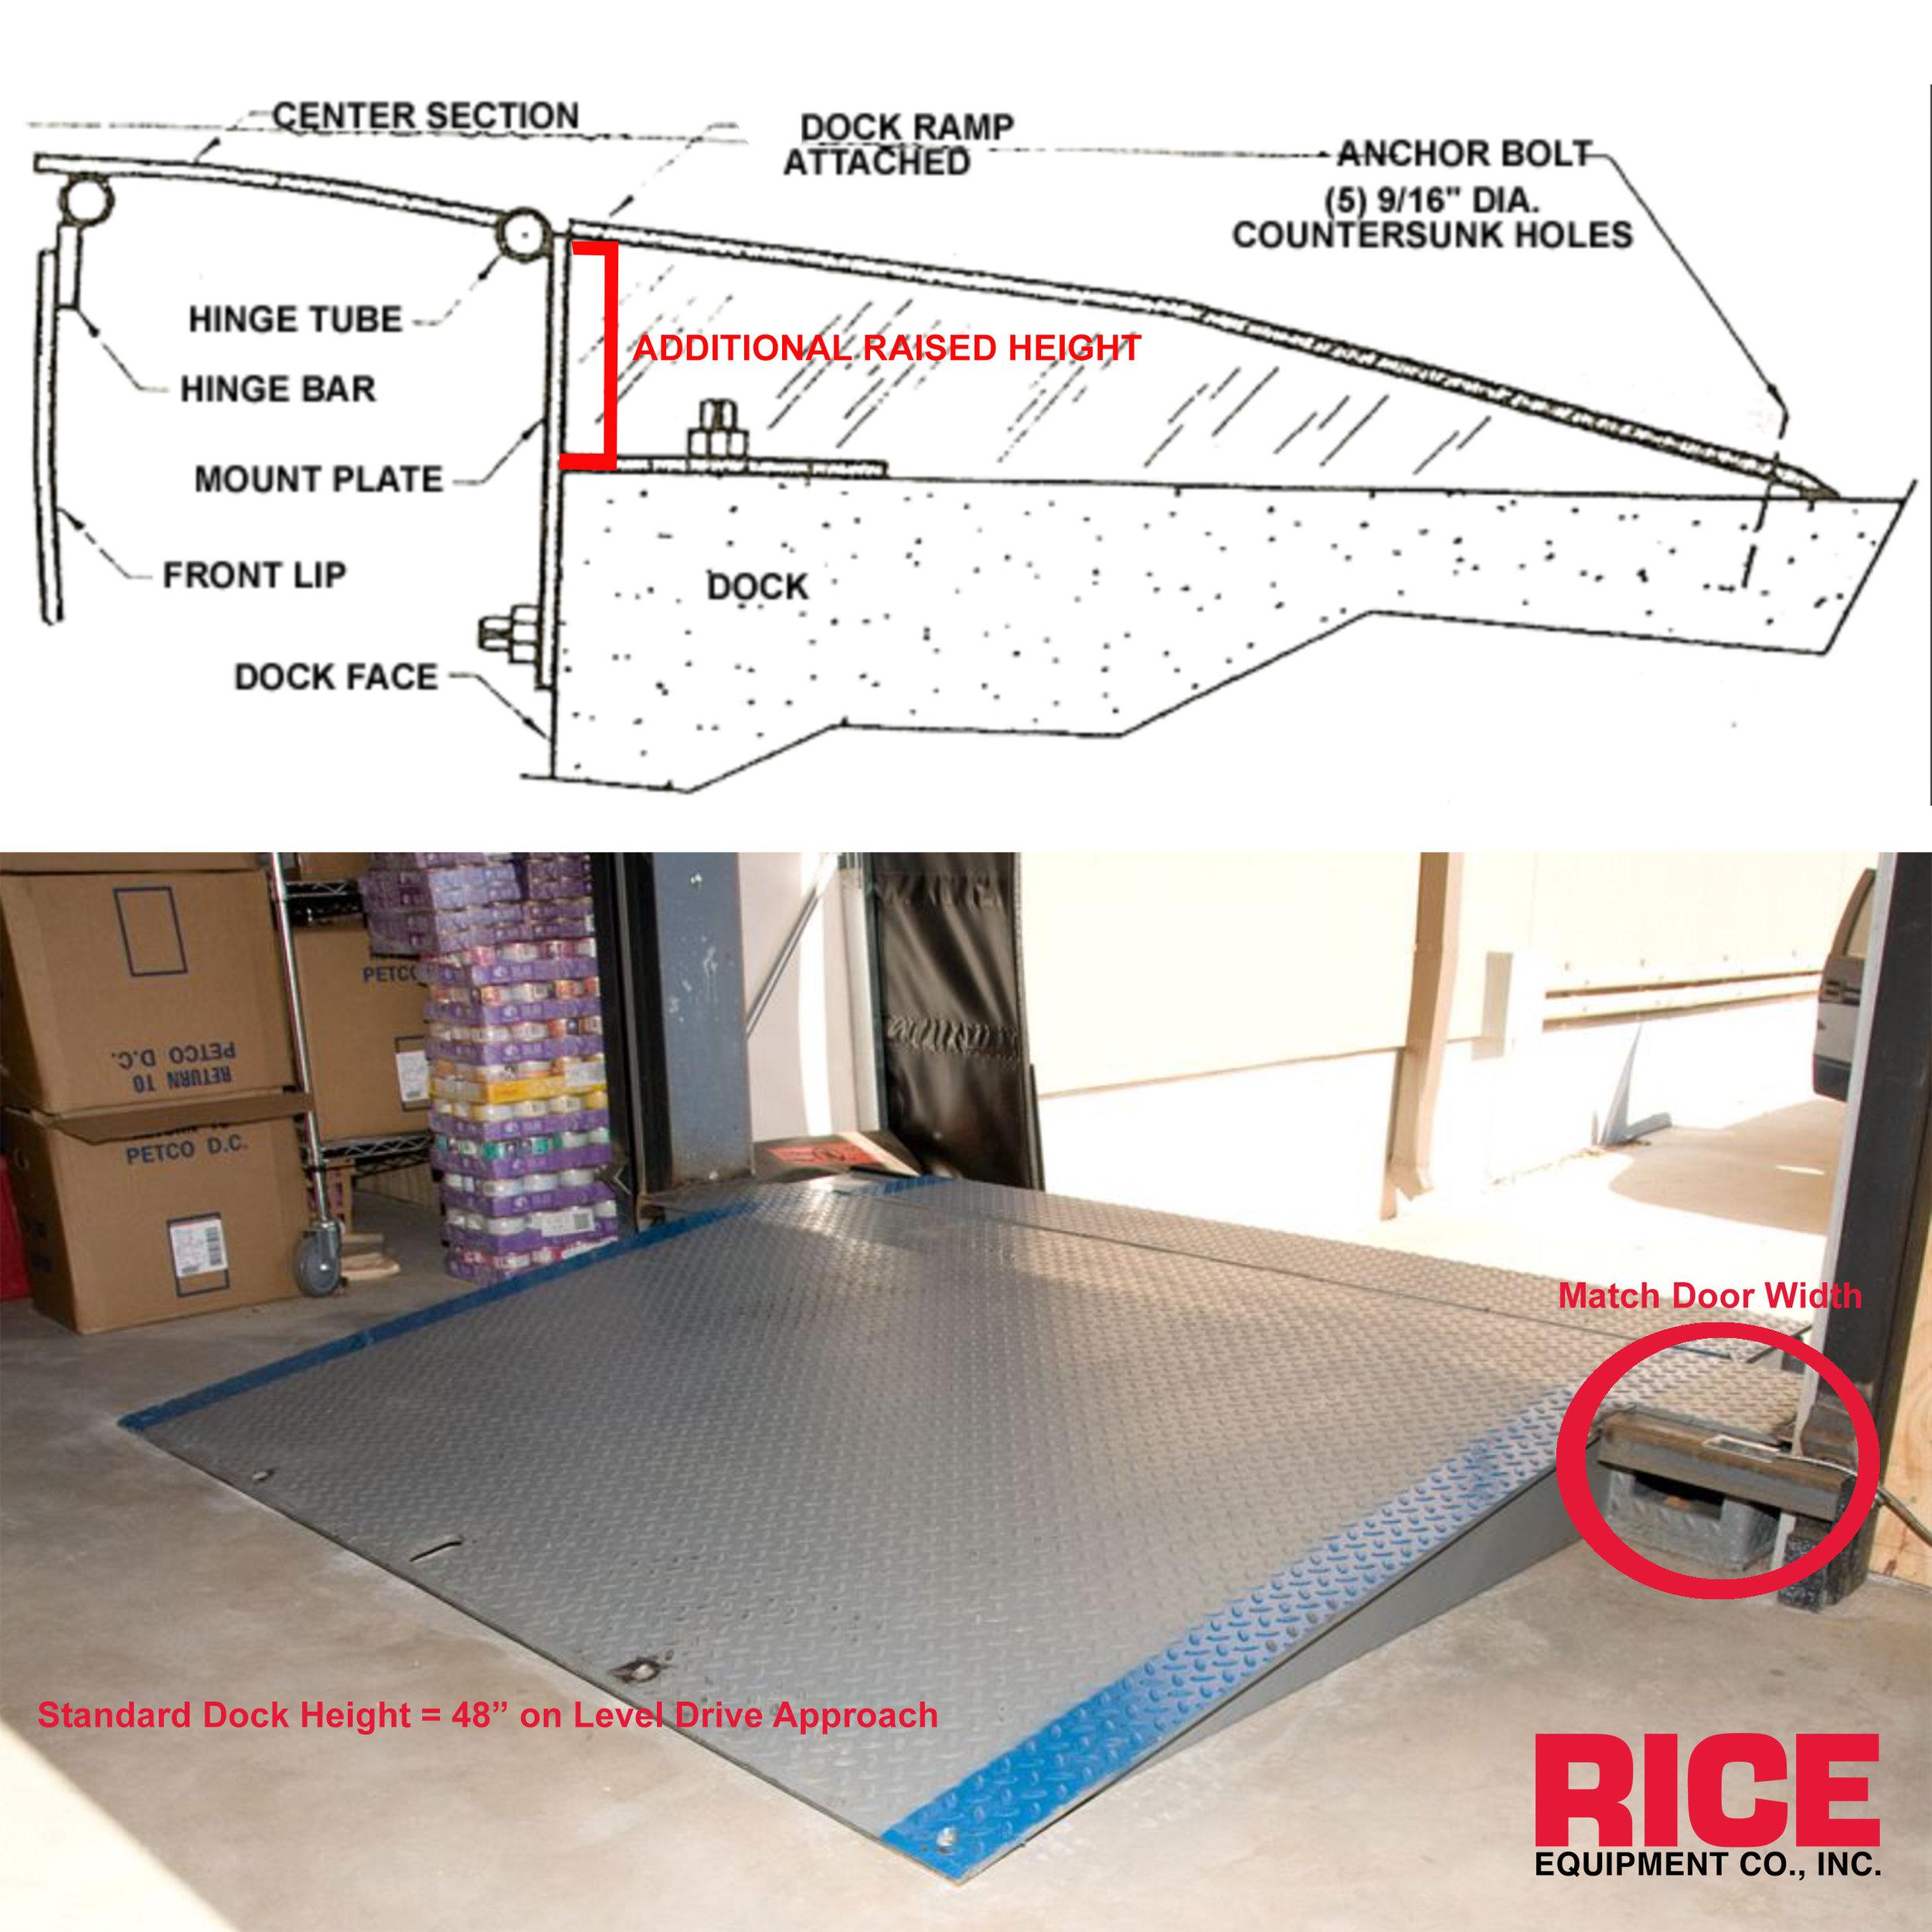 Raised EOD Leveler w Ramp Low dock position dock leveler too low rice equipment st Louis mo